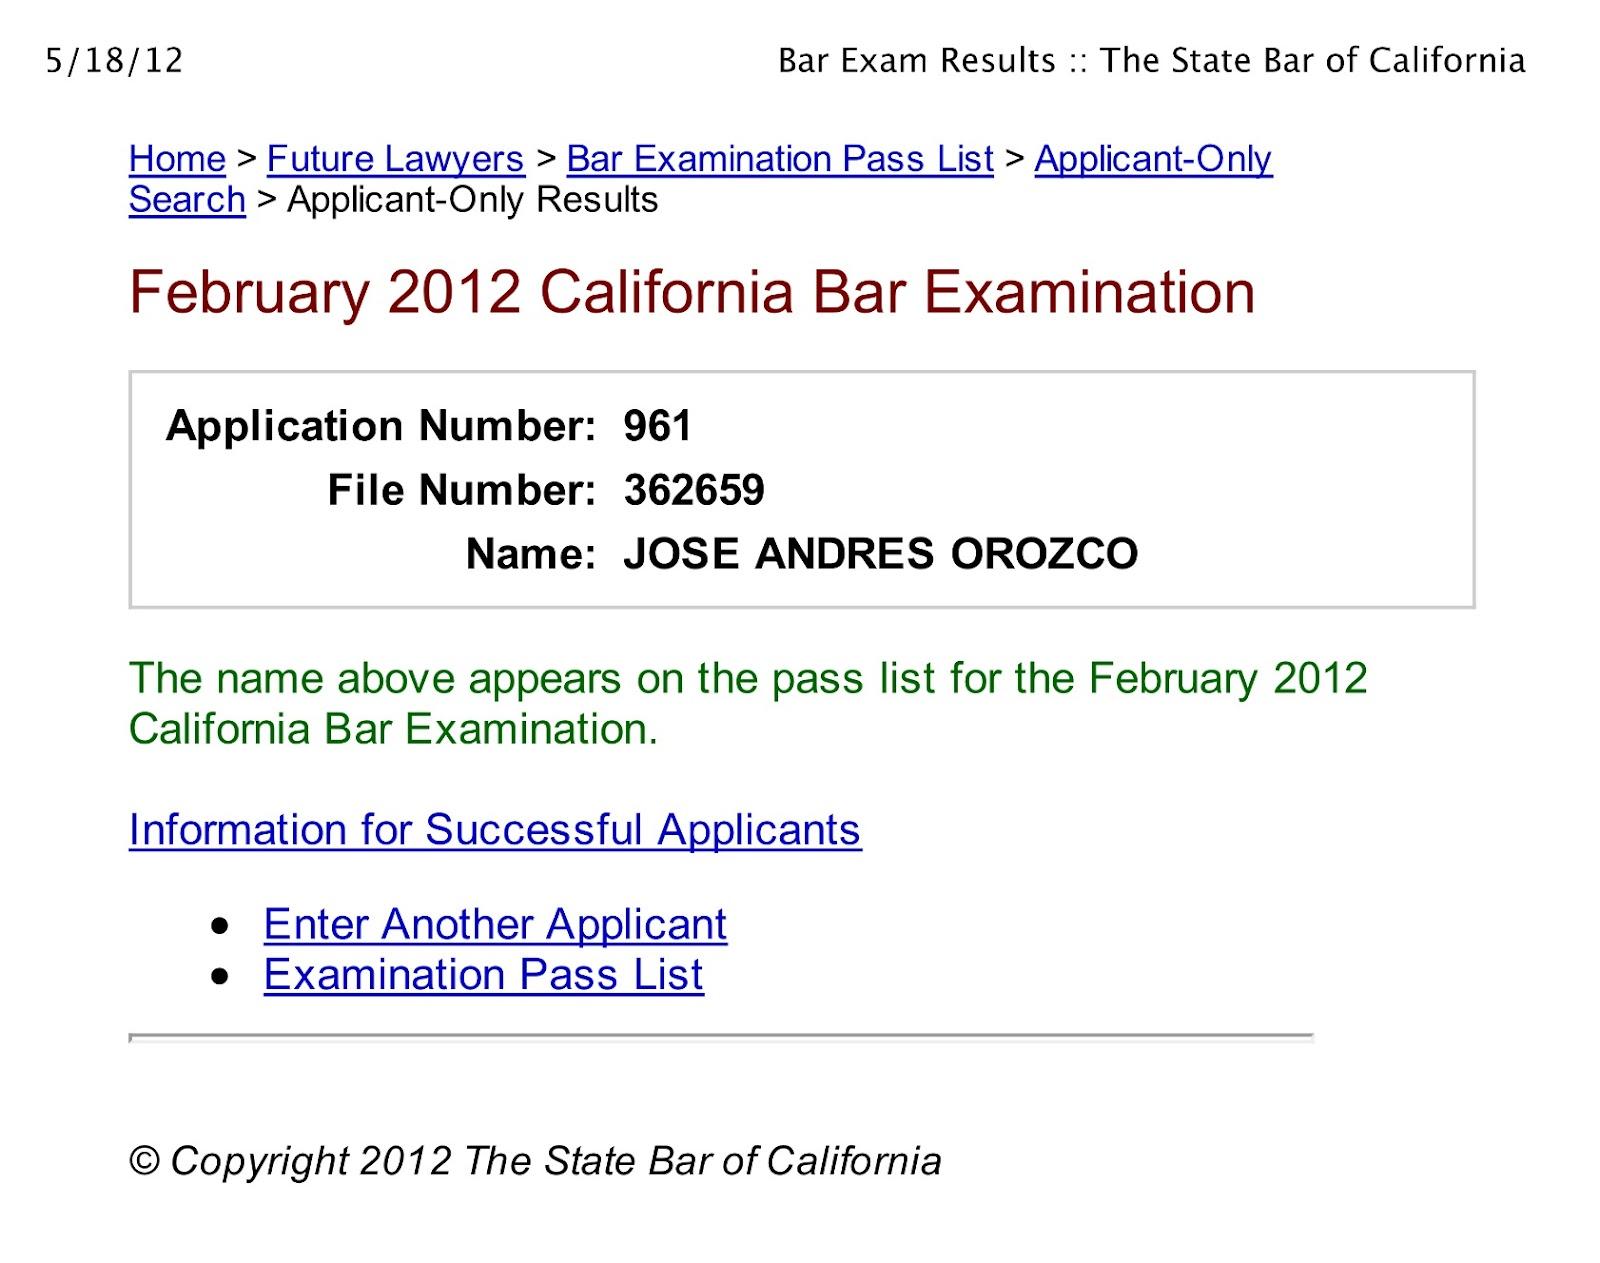 006 California Bar Essays February Term Paper Academic